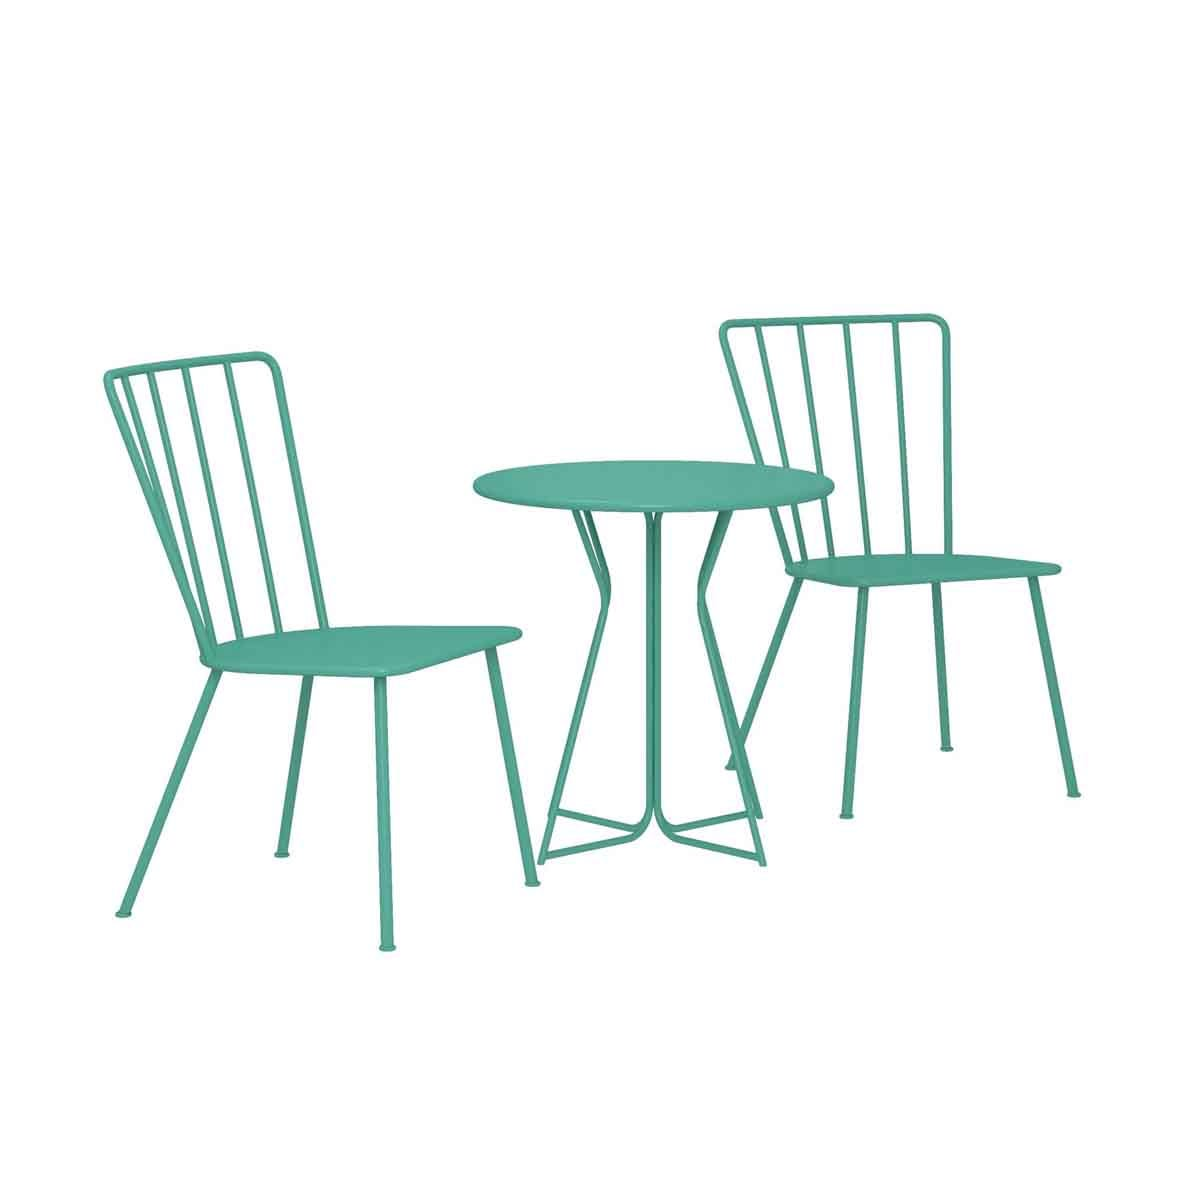 Dorel Heidi 3 Piece Bistro Set - Turquoise